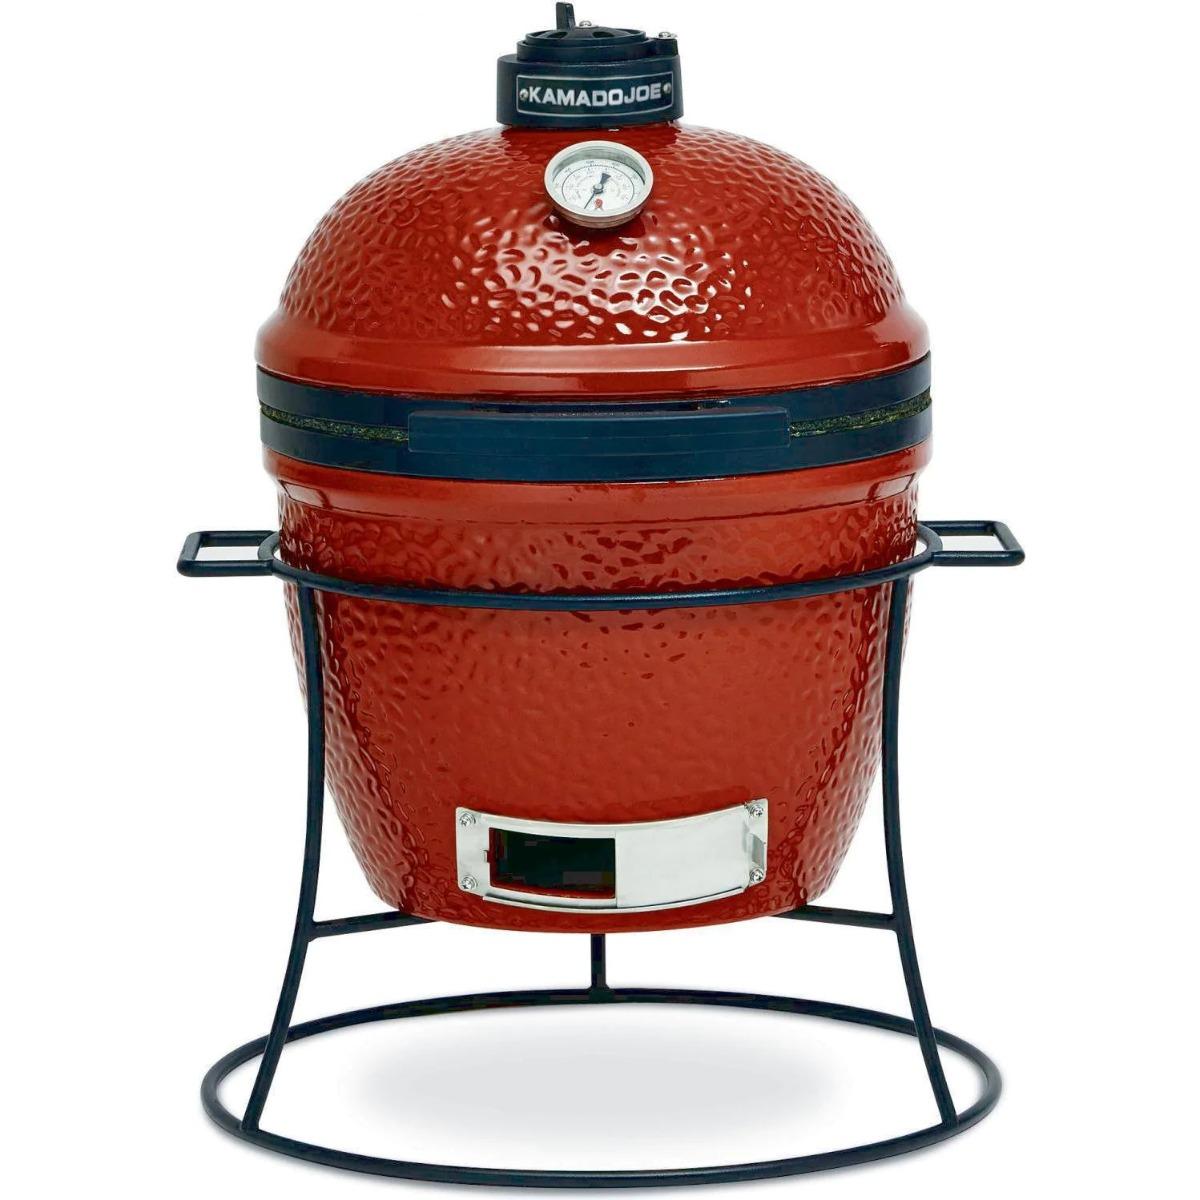 Kamado Joe Joe Jr Ceramic Grills On Stand - KJ13RH